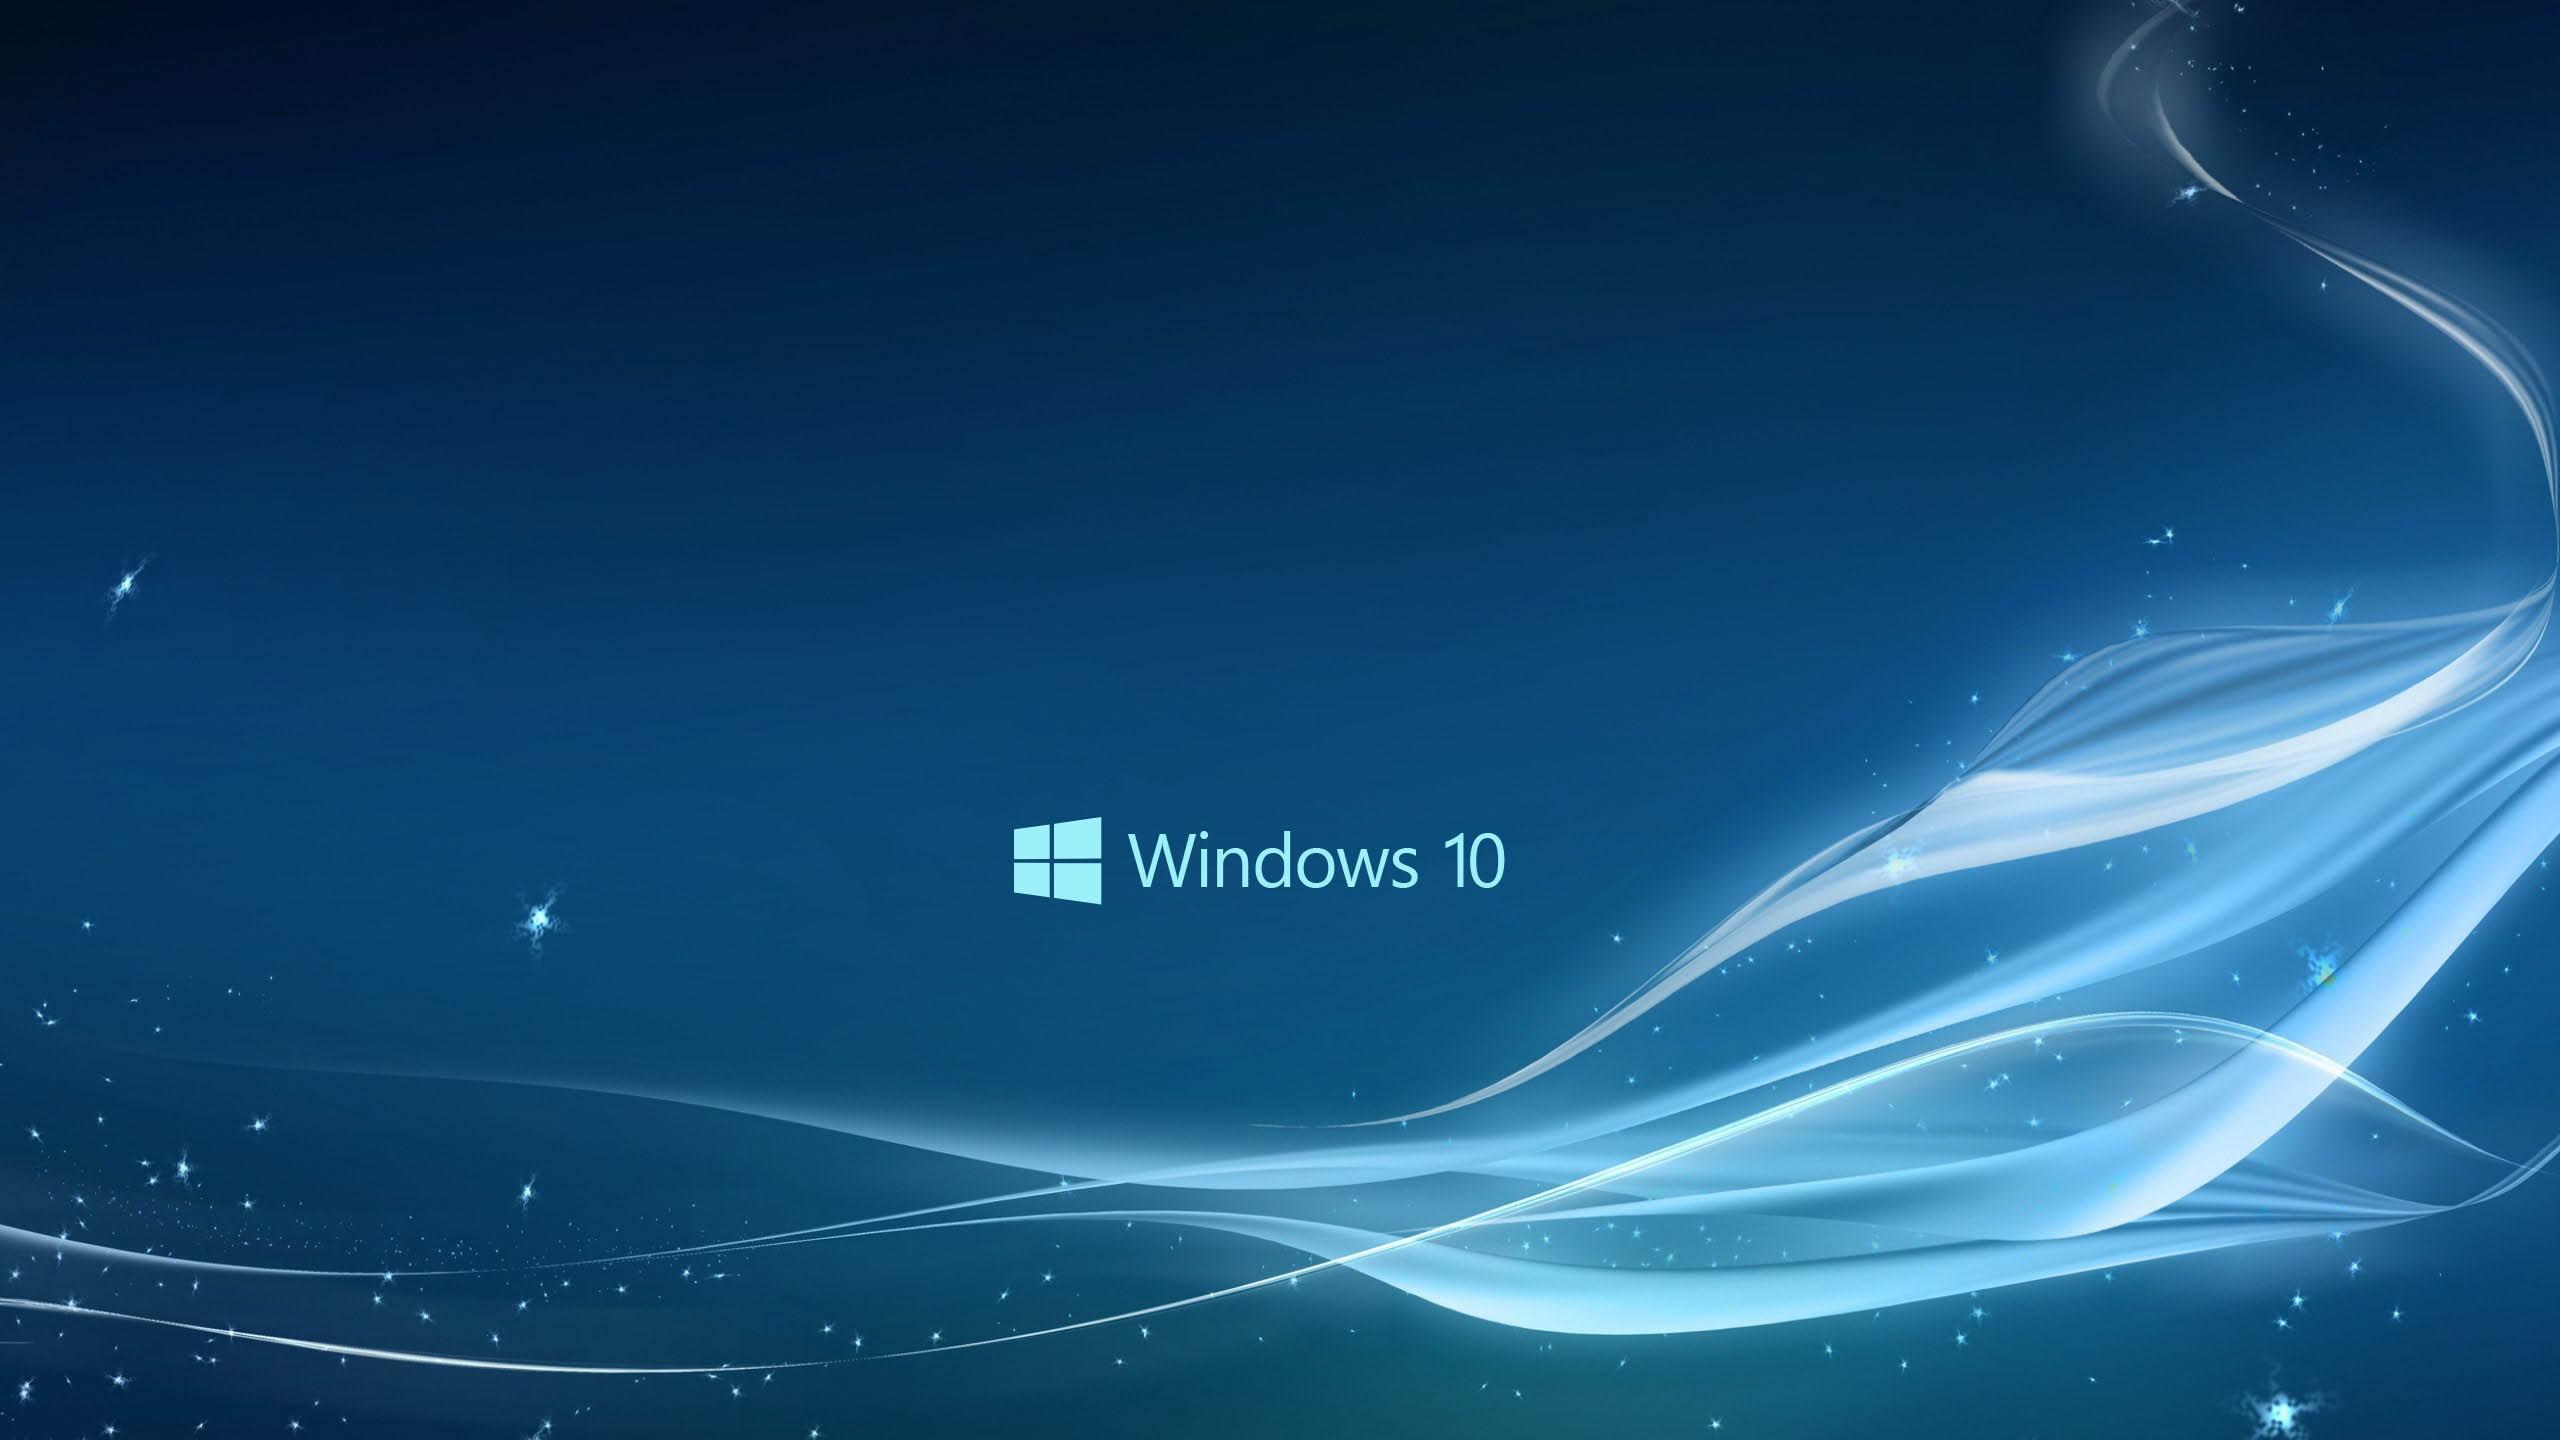 Windows 10 HD wallpaper 2015 2560x1440   Wallpaper   Wallpaper Style 2560x1440